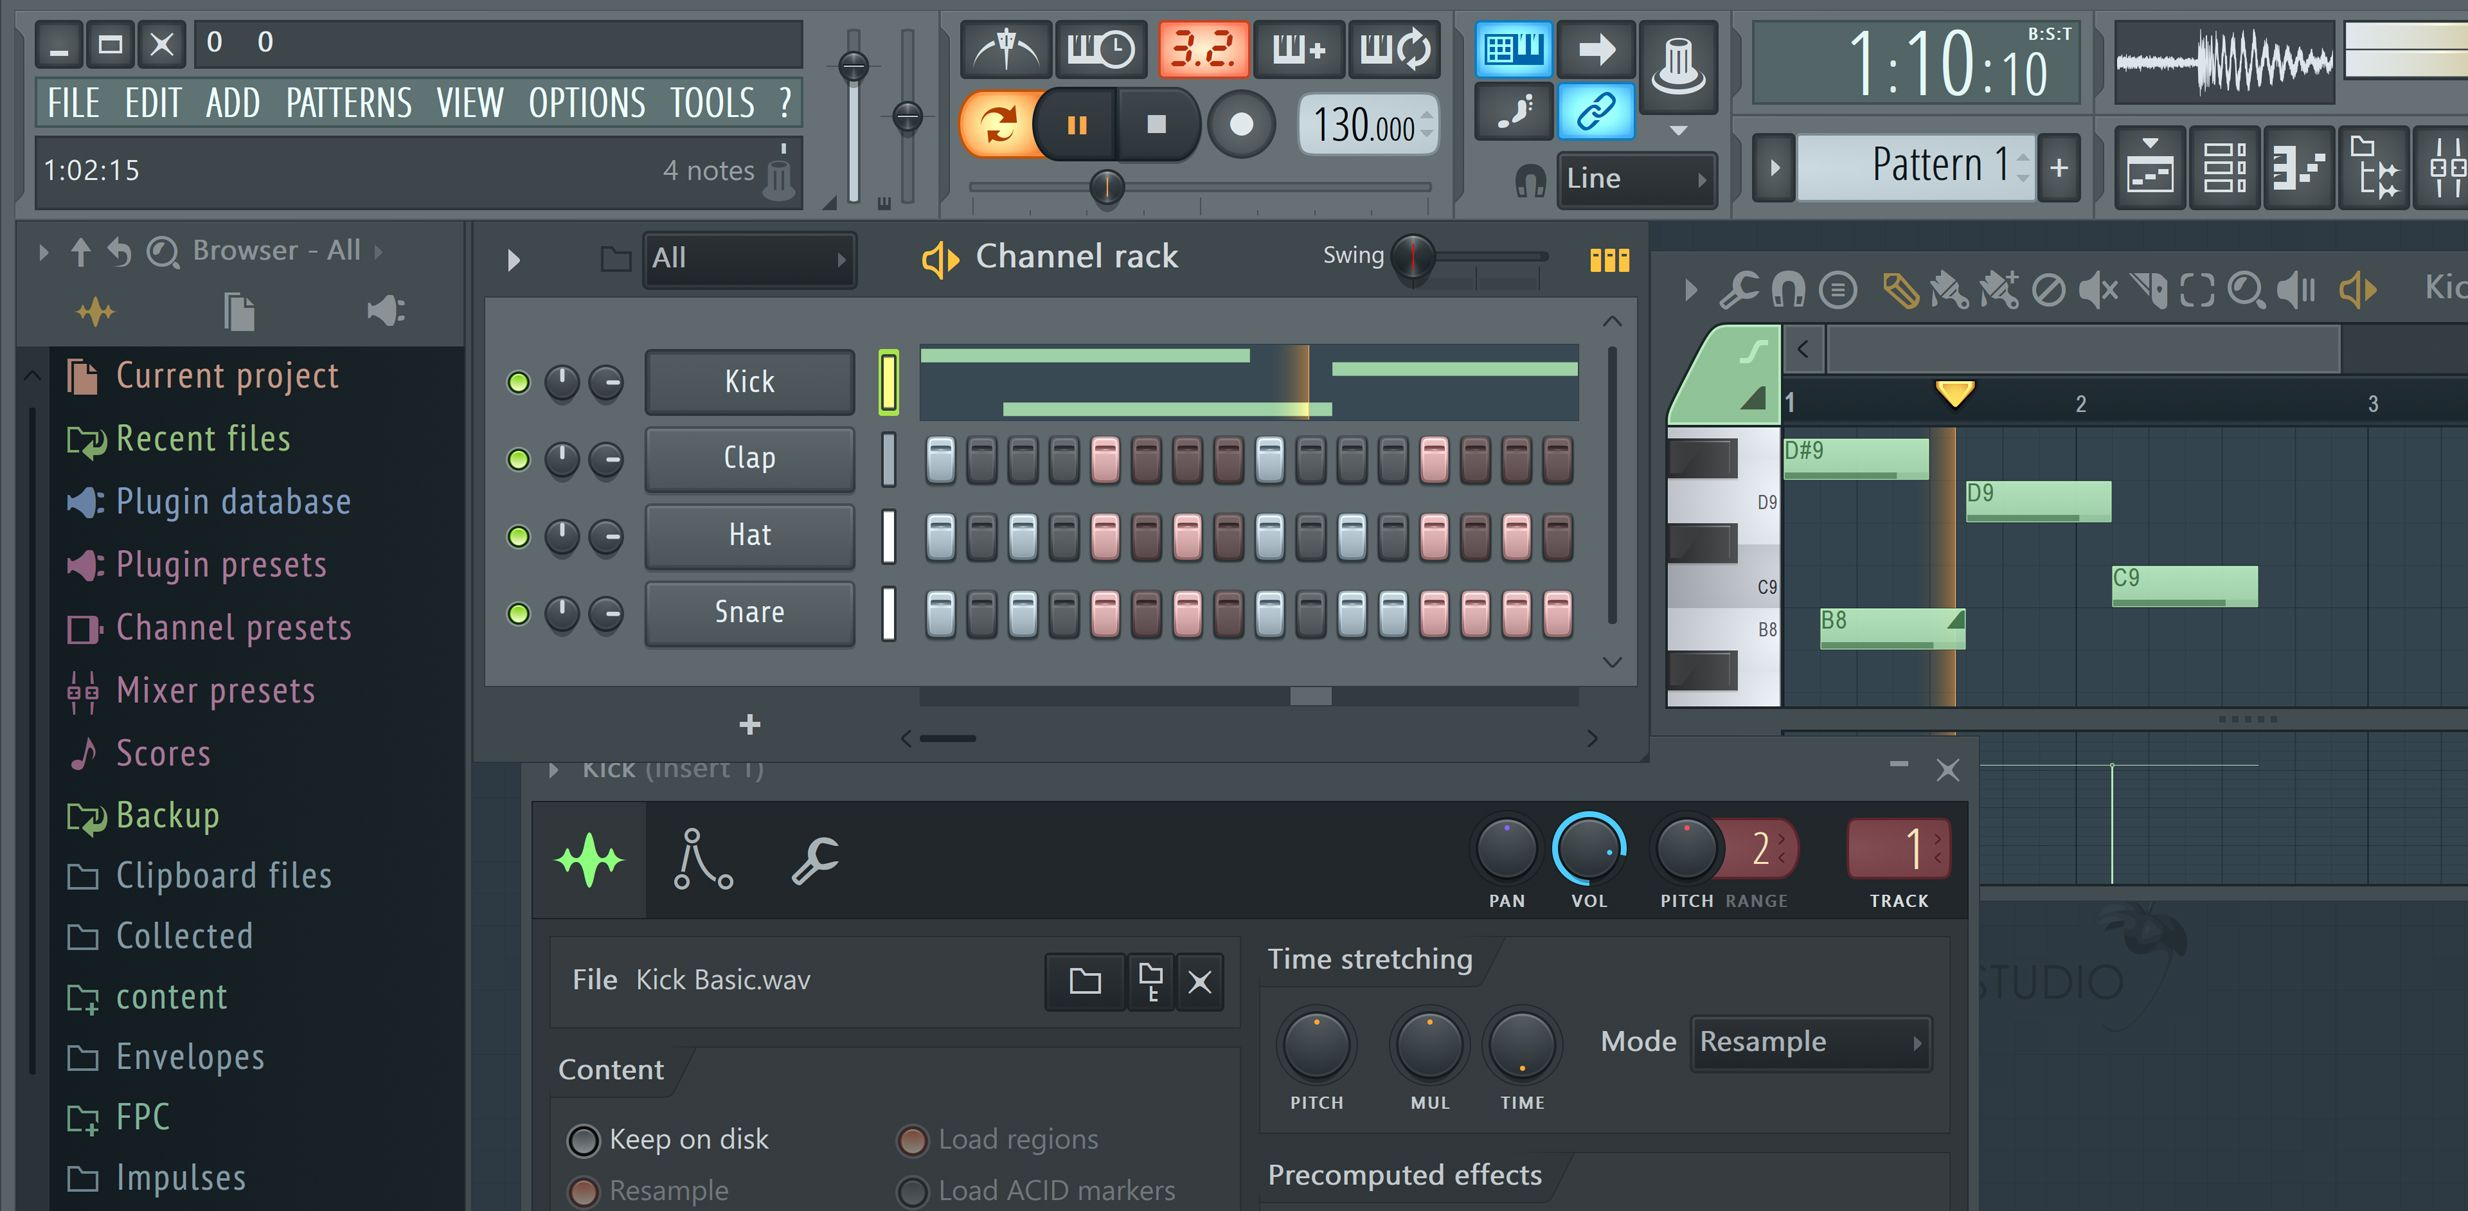 fl studio 12 demo mac